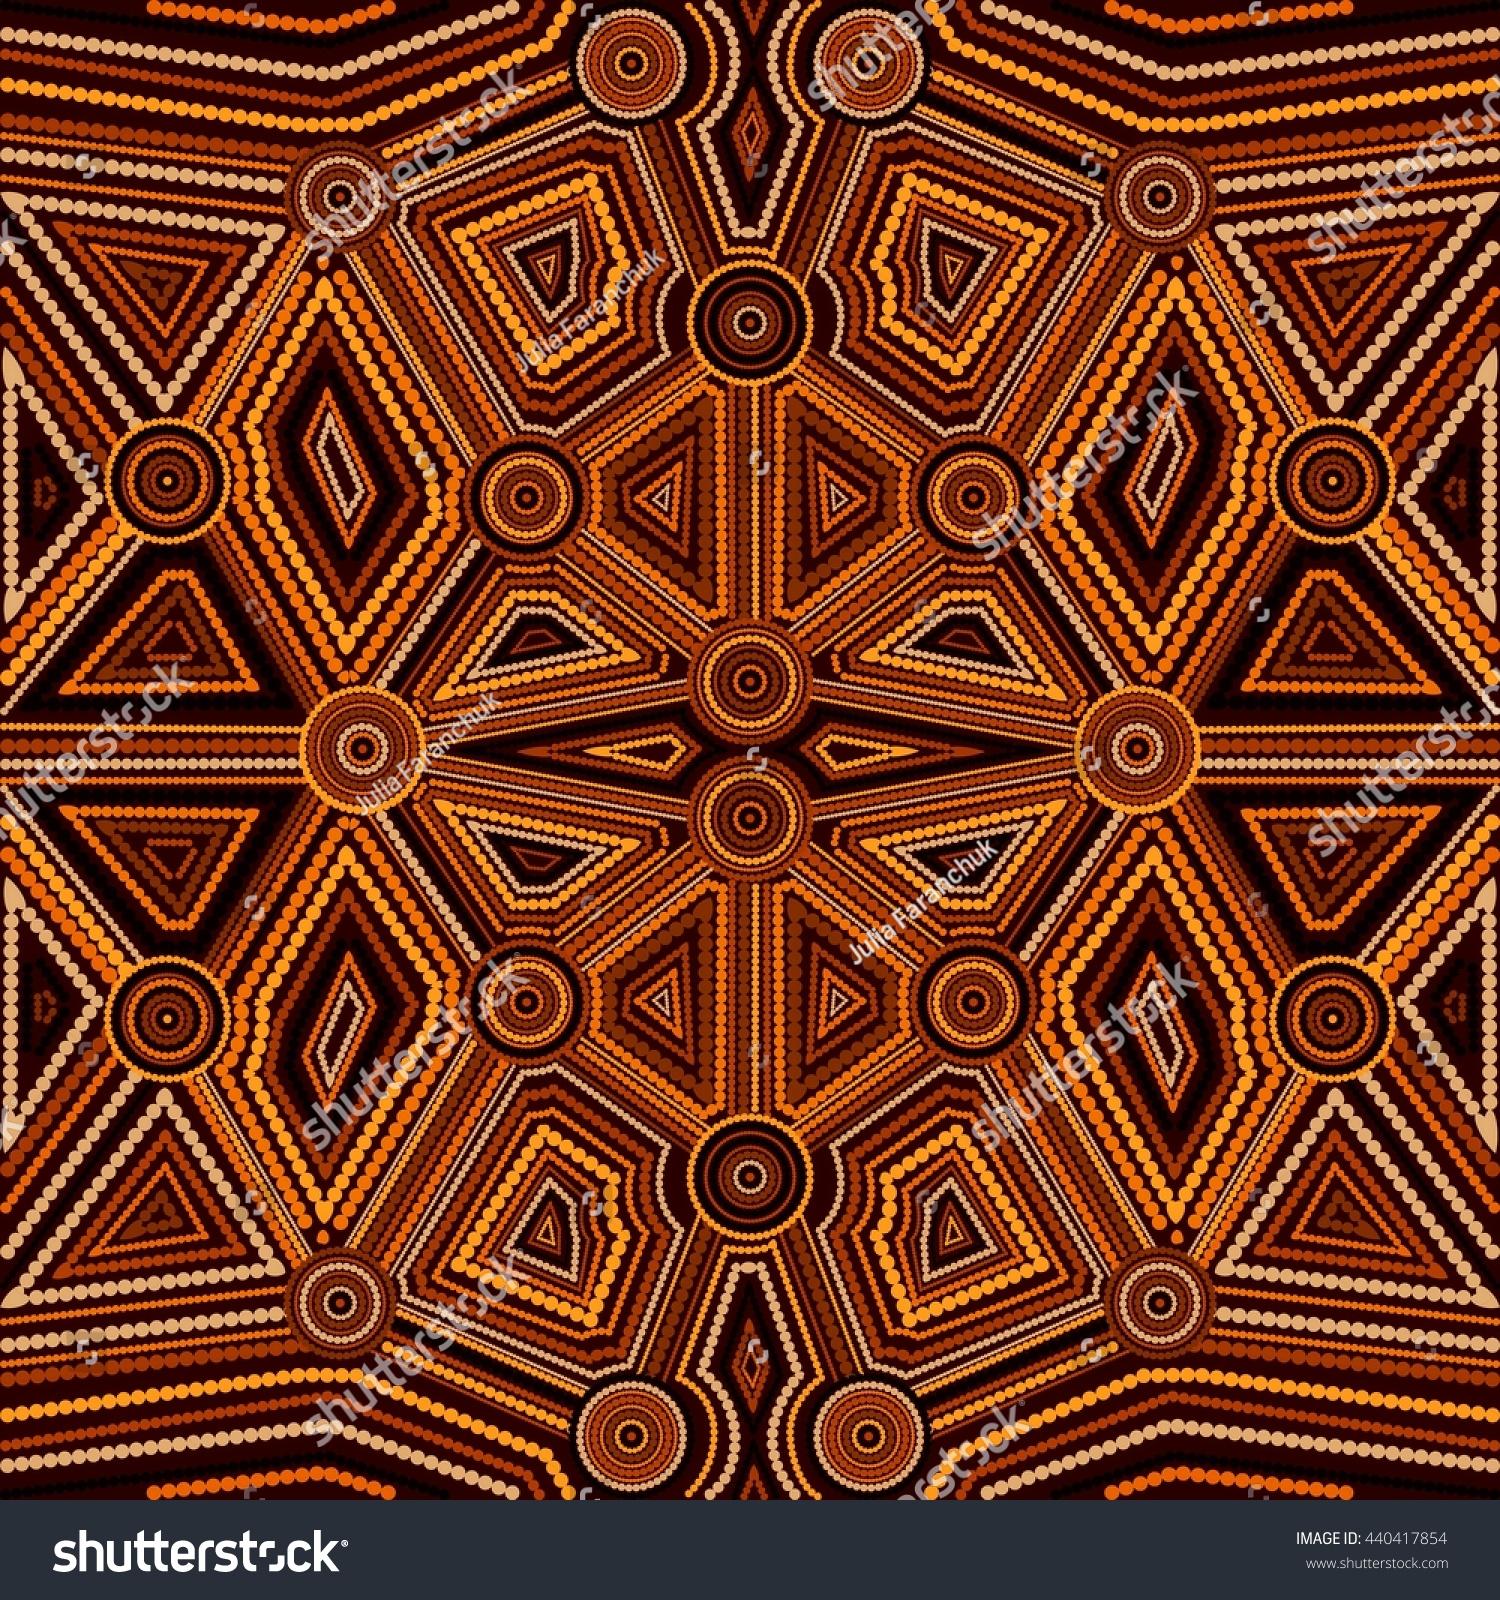 Abstract Style Australian Aboriginal Art Geometric Stock